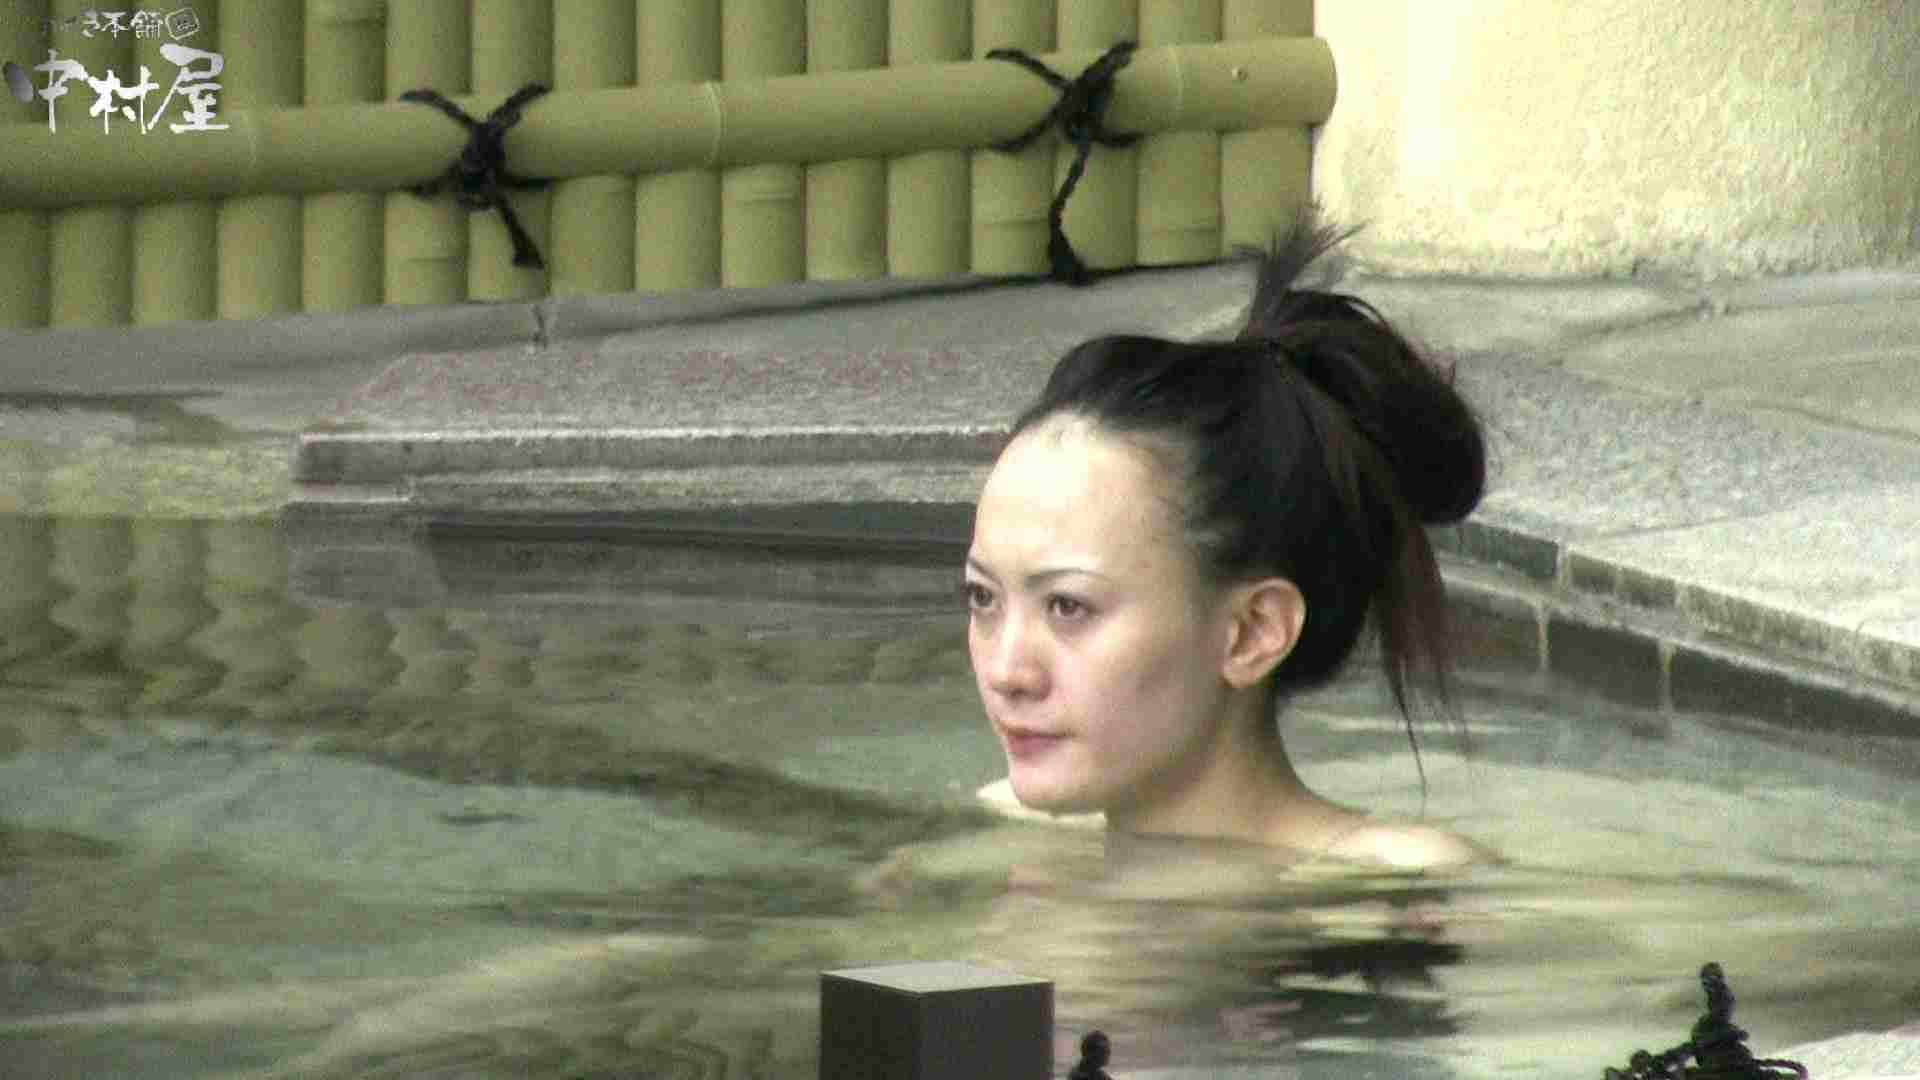 Aquaな露天風呂Vol.900 盗撮師作品 ヌード画像 86pic 26